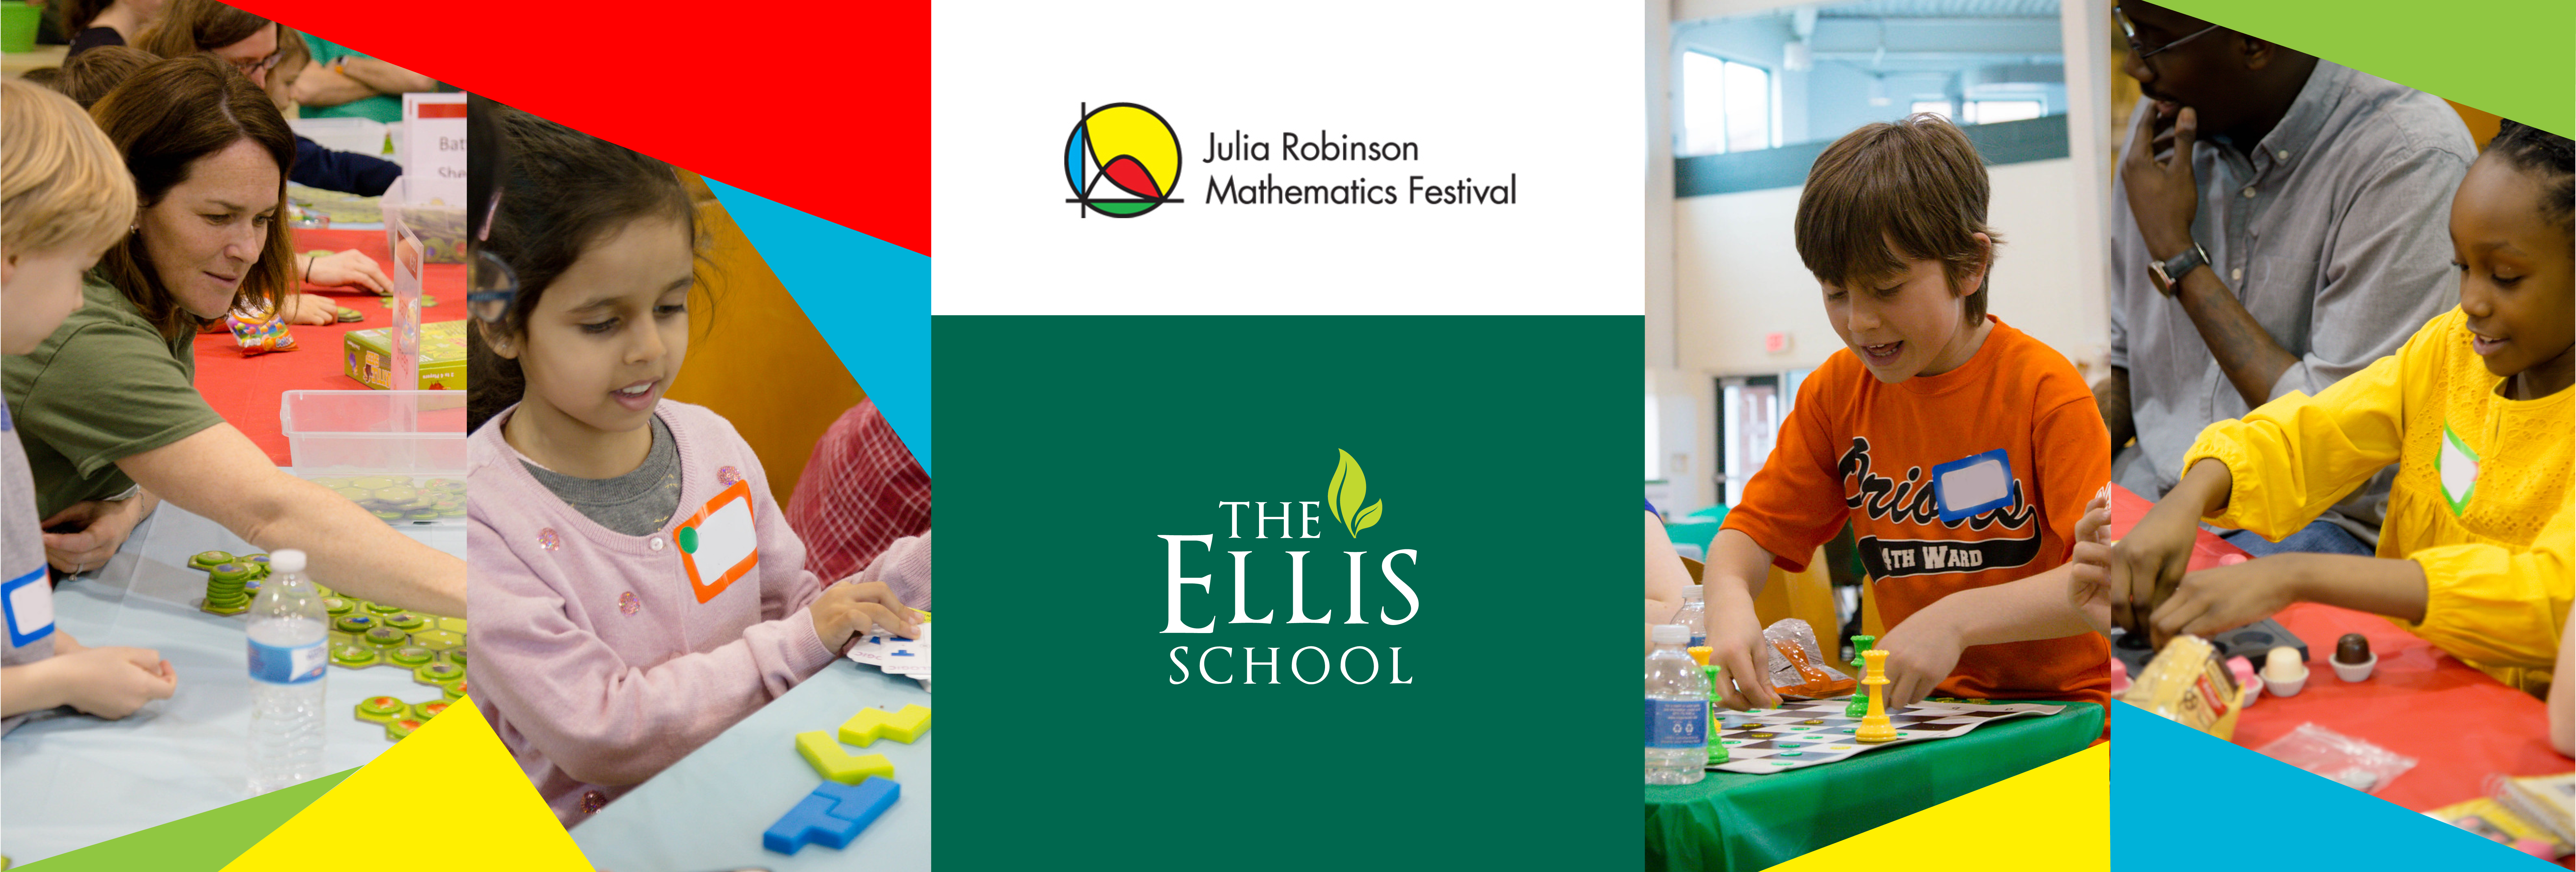 Julia Robinson Math Festival at The Ellis School